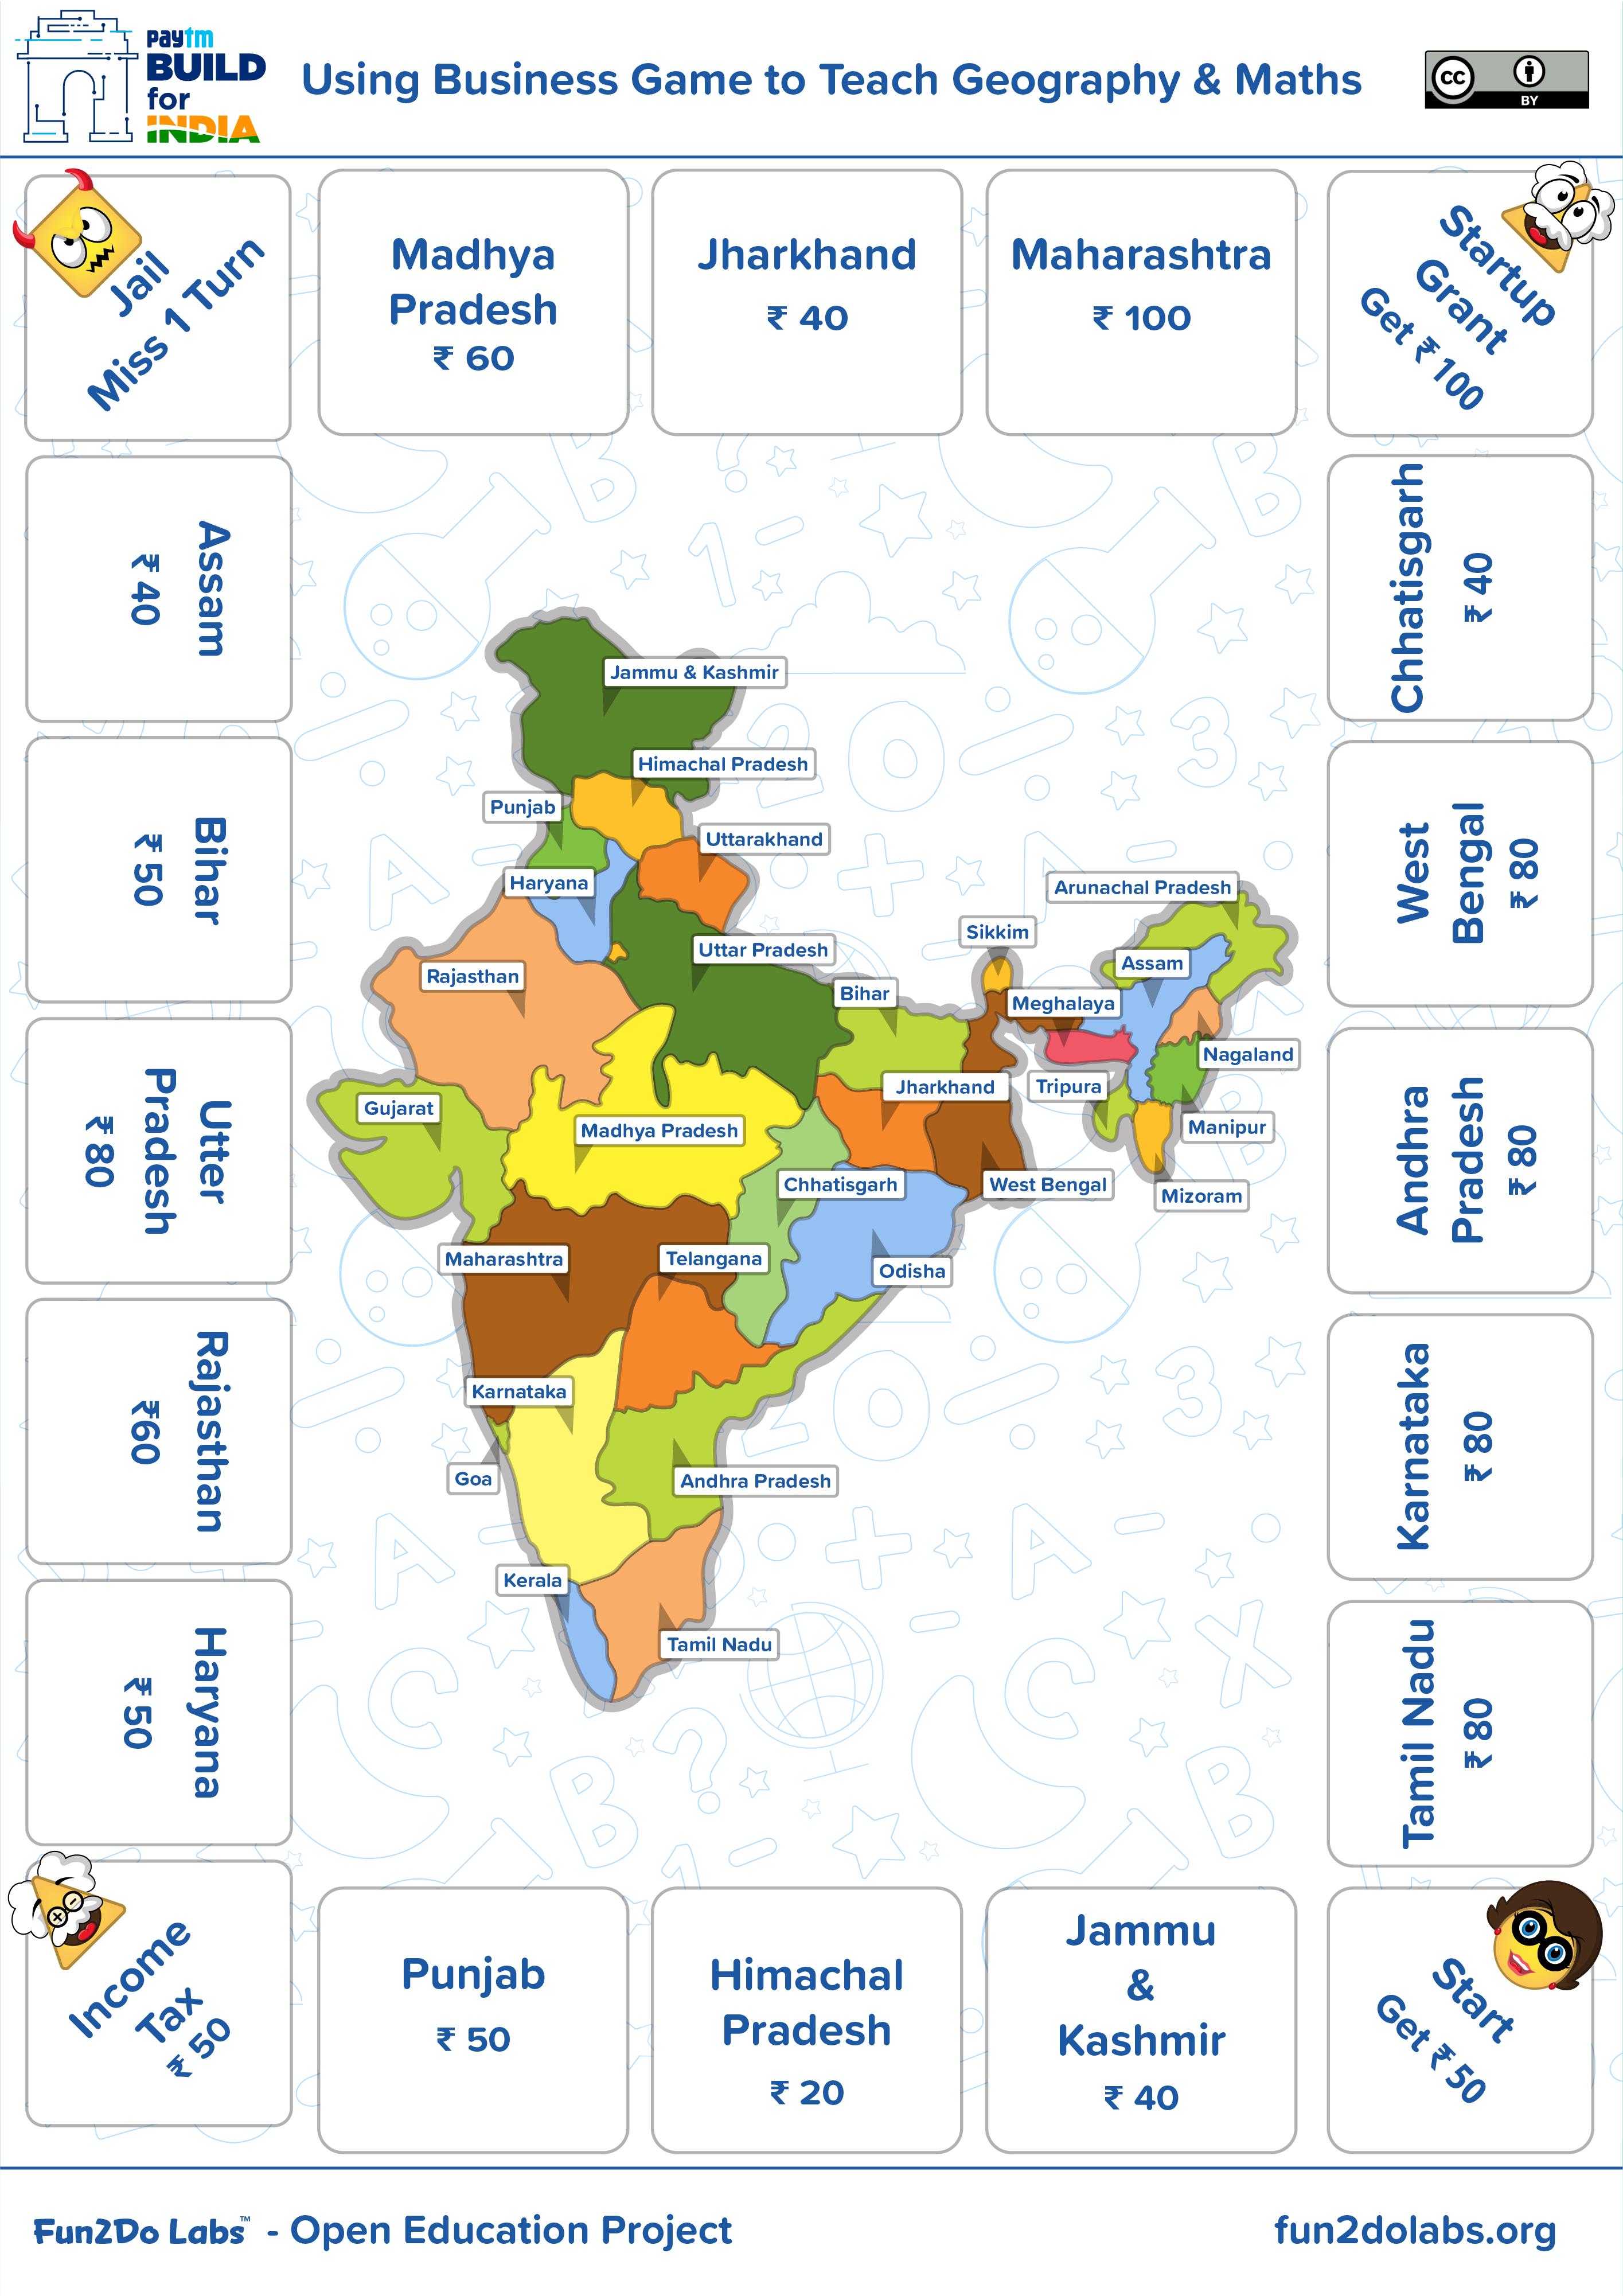 Monopoly Printable, Monopoly Games, Monopoly Board Game